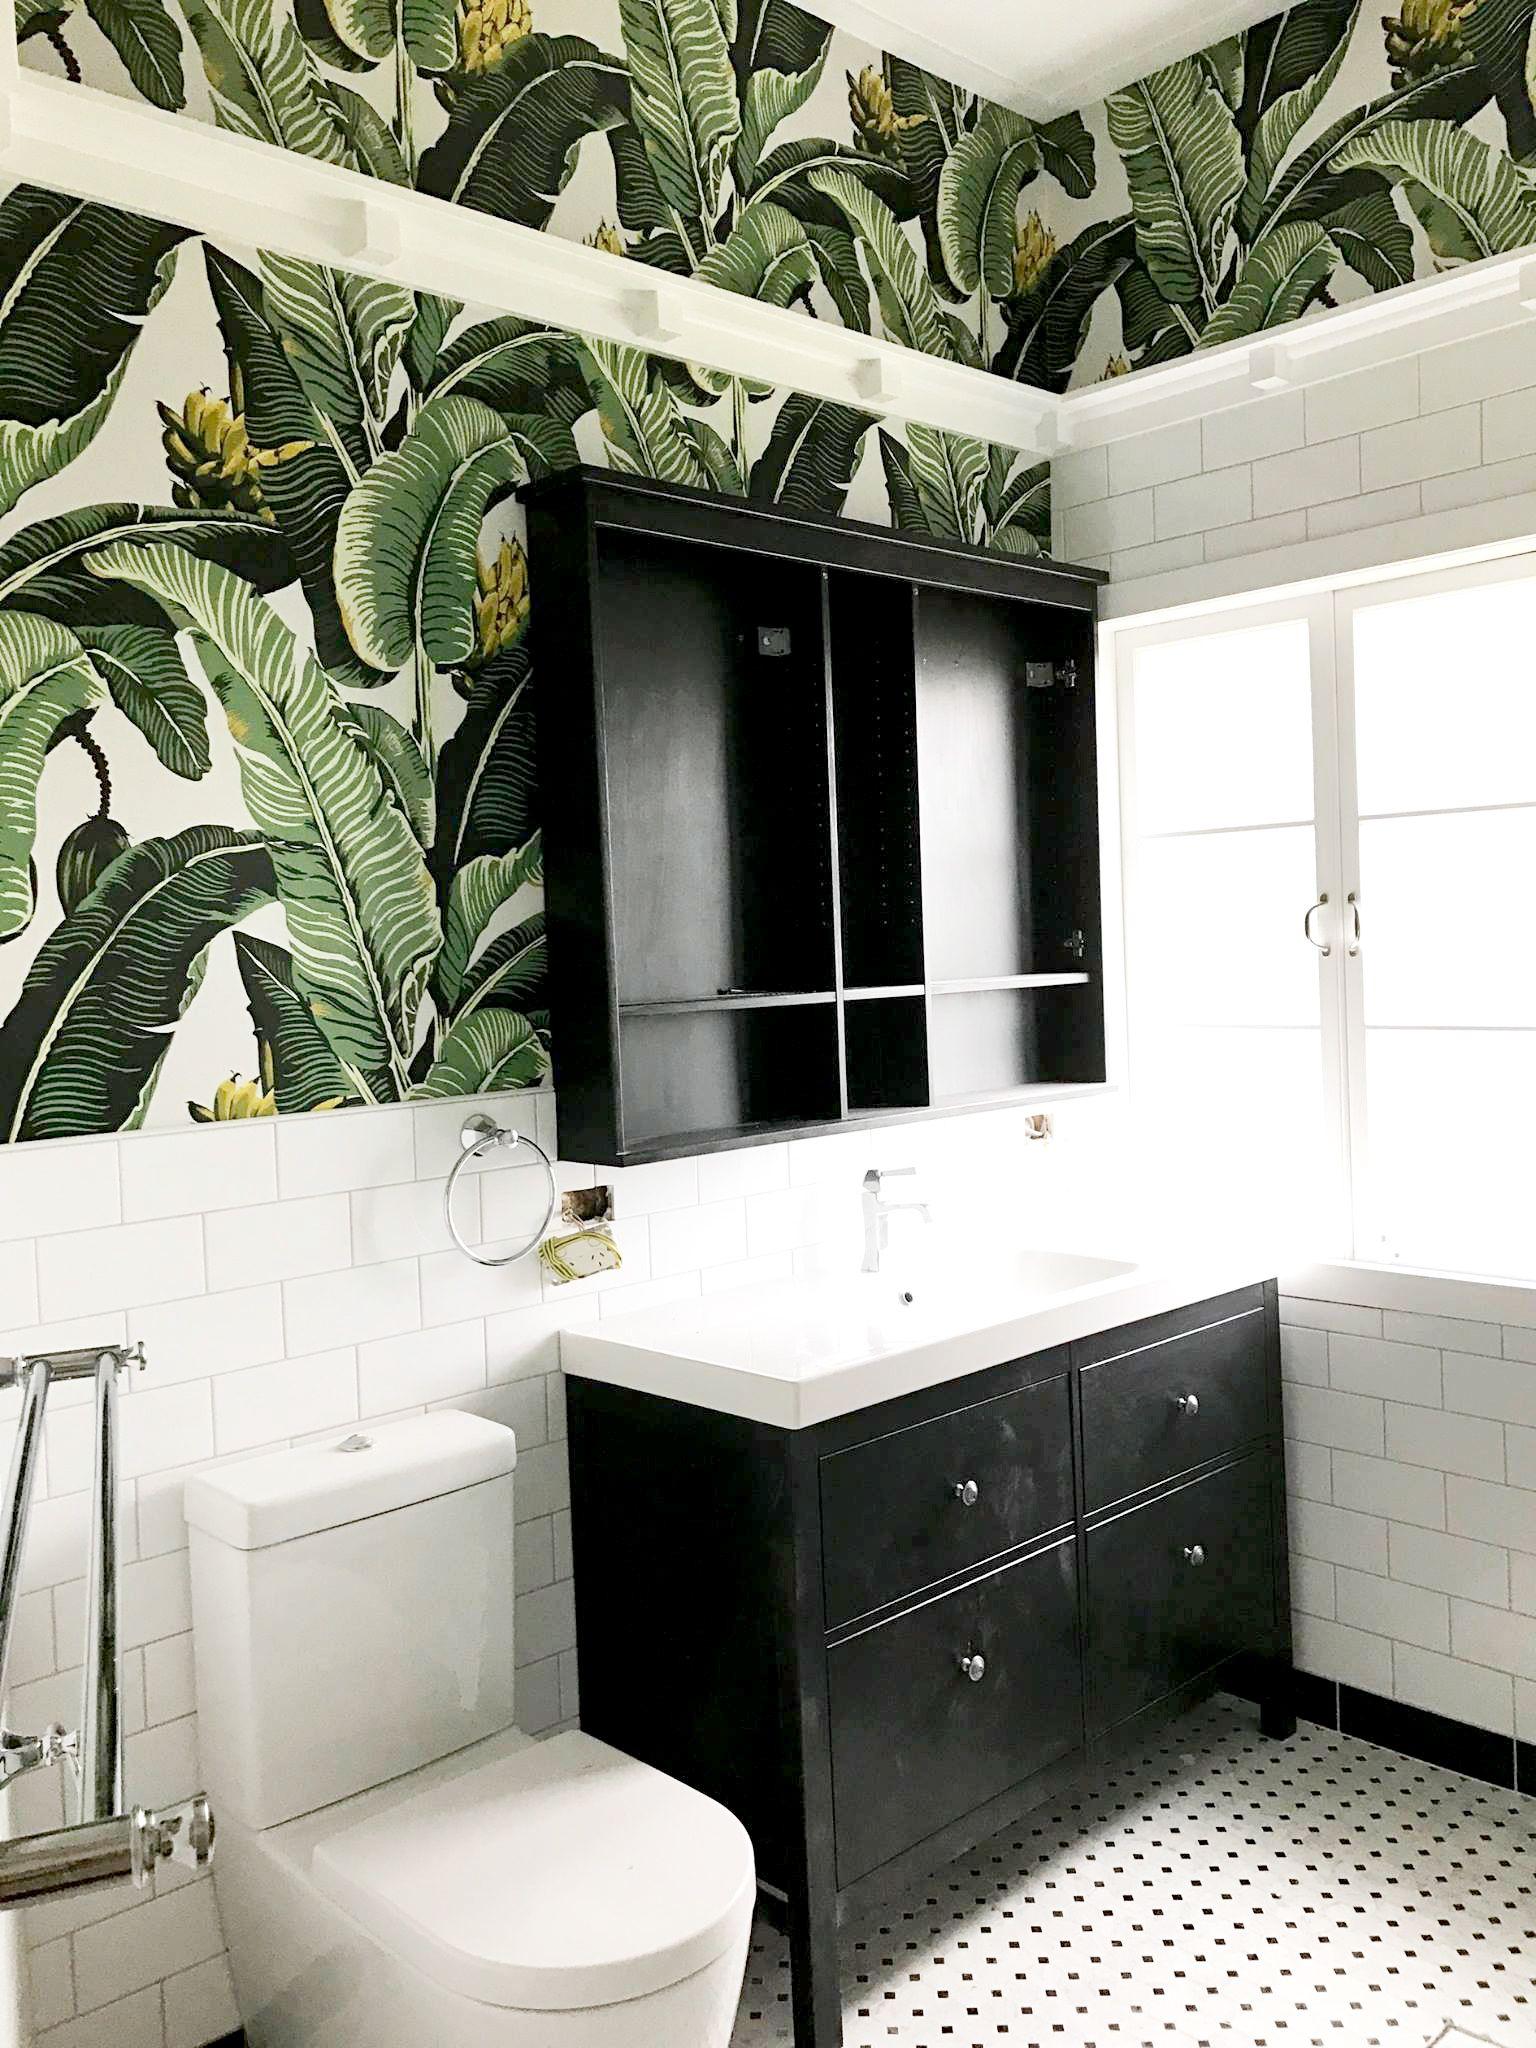 Kingdom Palm Wallpaper Tropical Botanical Decor Palm